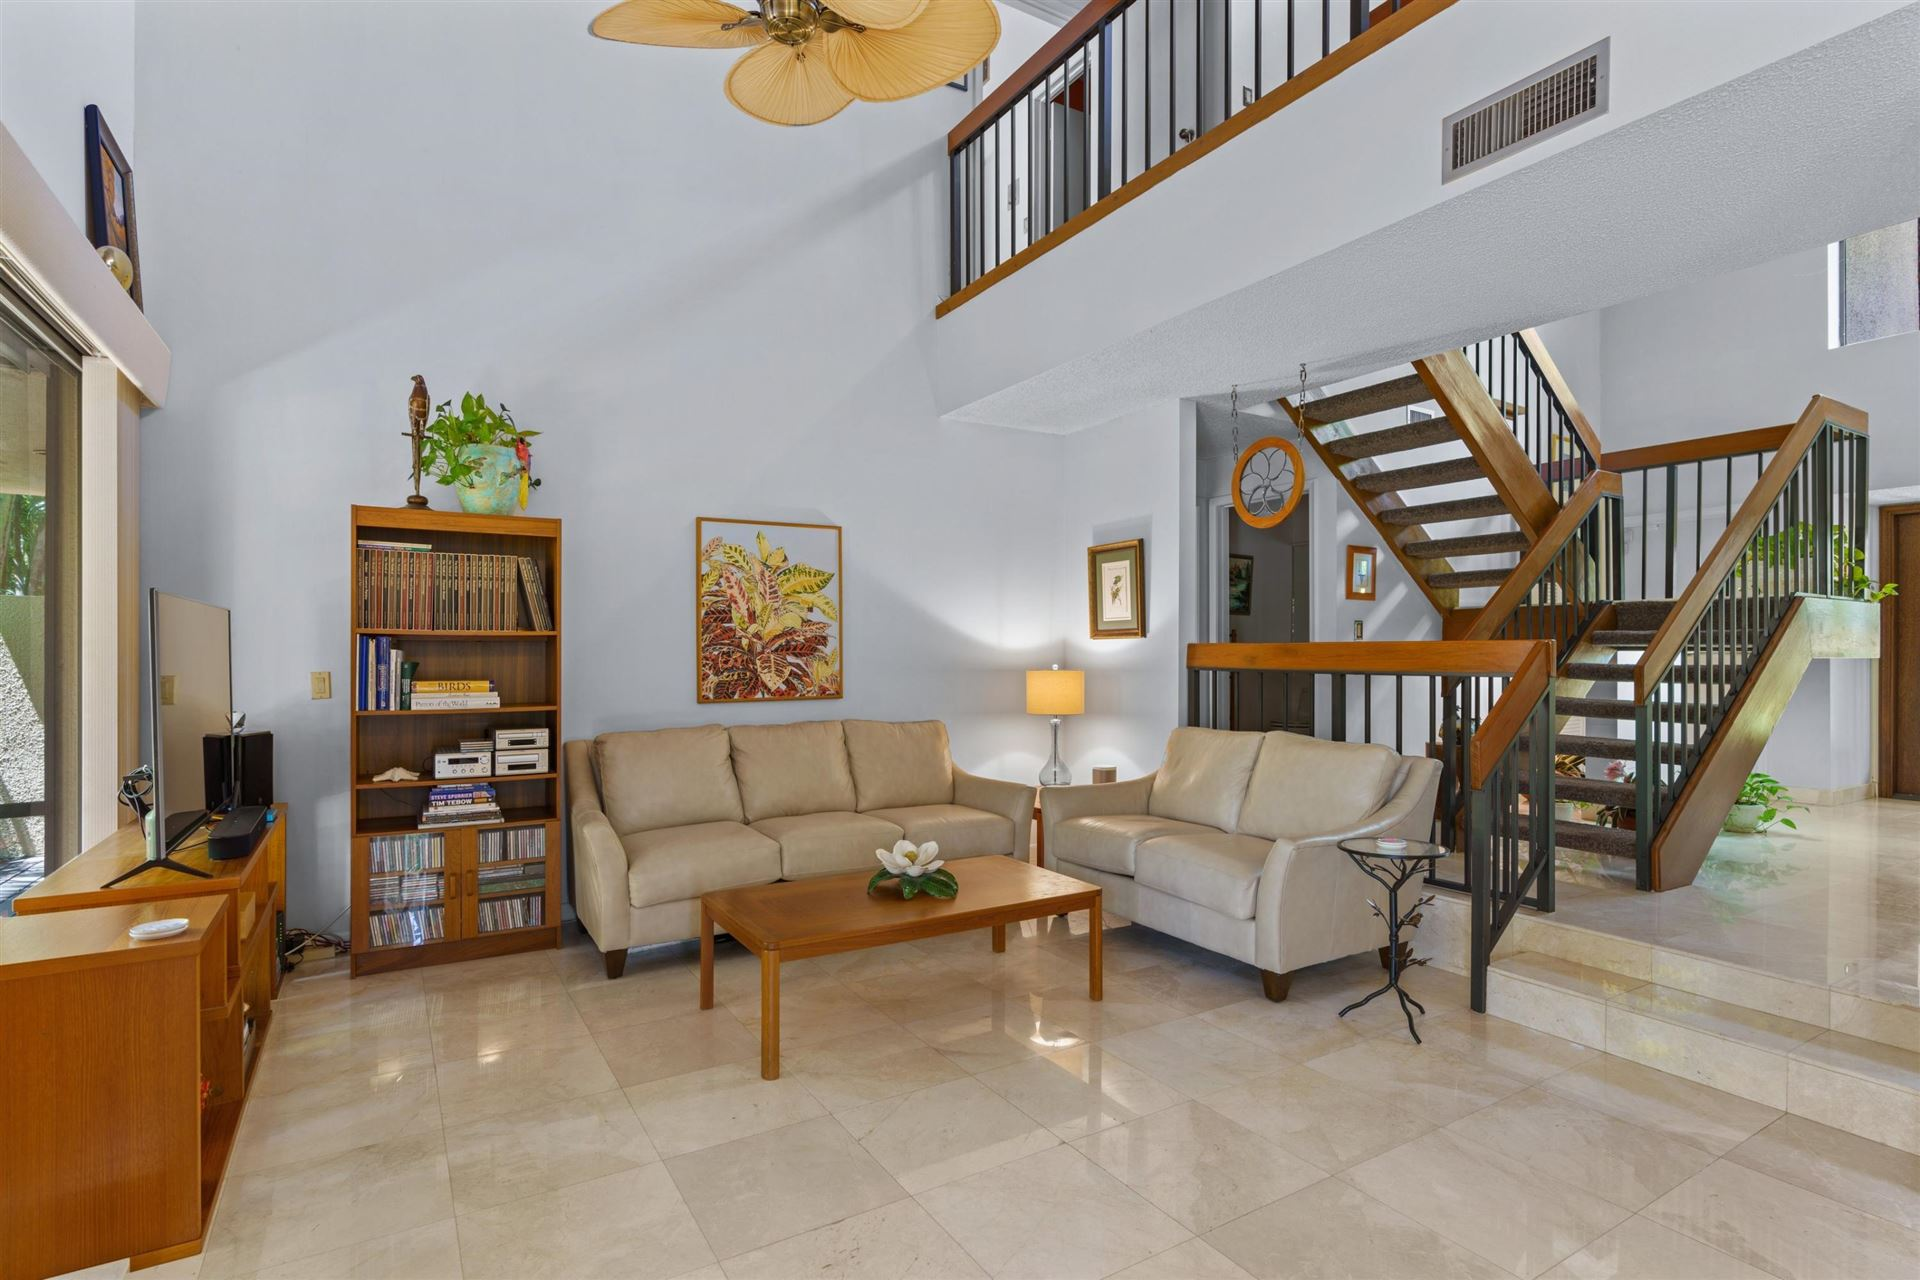 Photo of 758 Saint Albans Drive, Boca Raton, FL 33486 (MLS # RX-10707890)